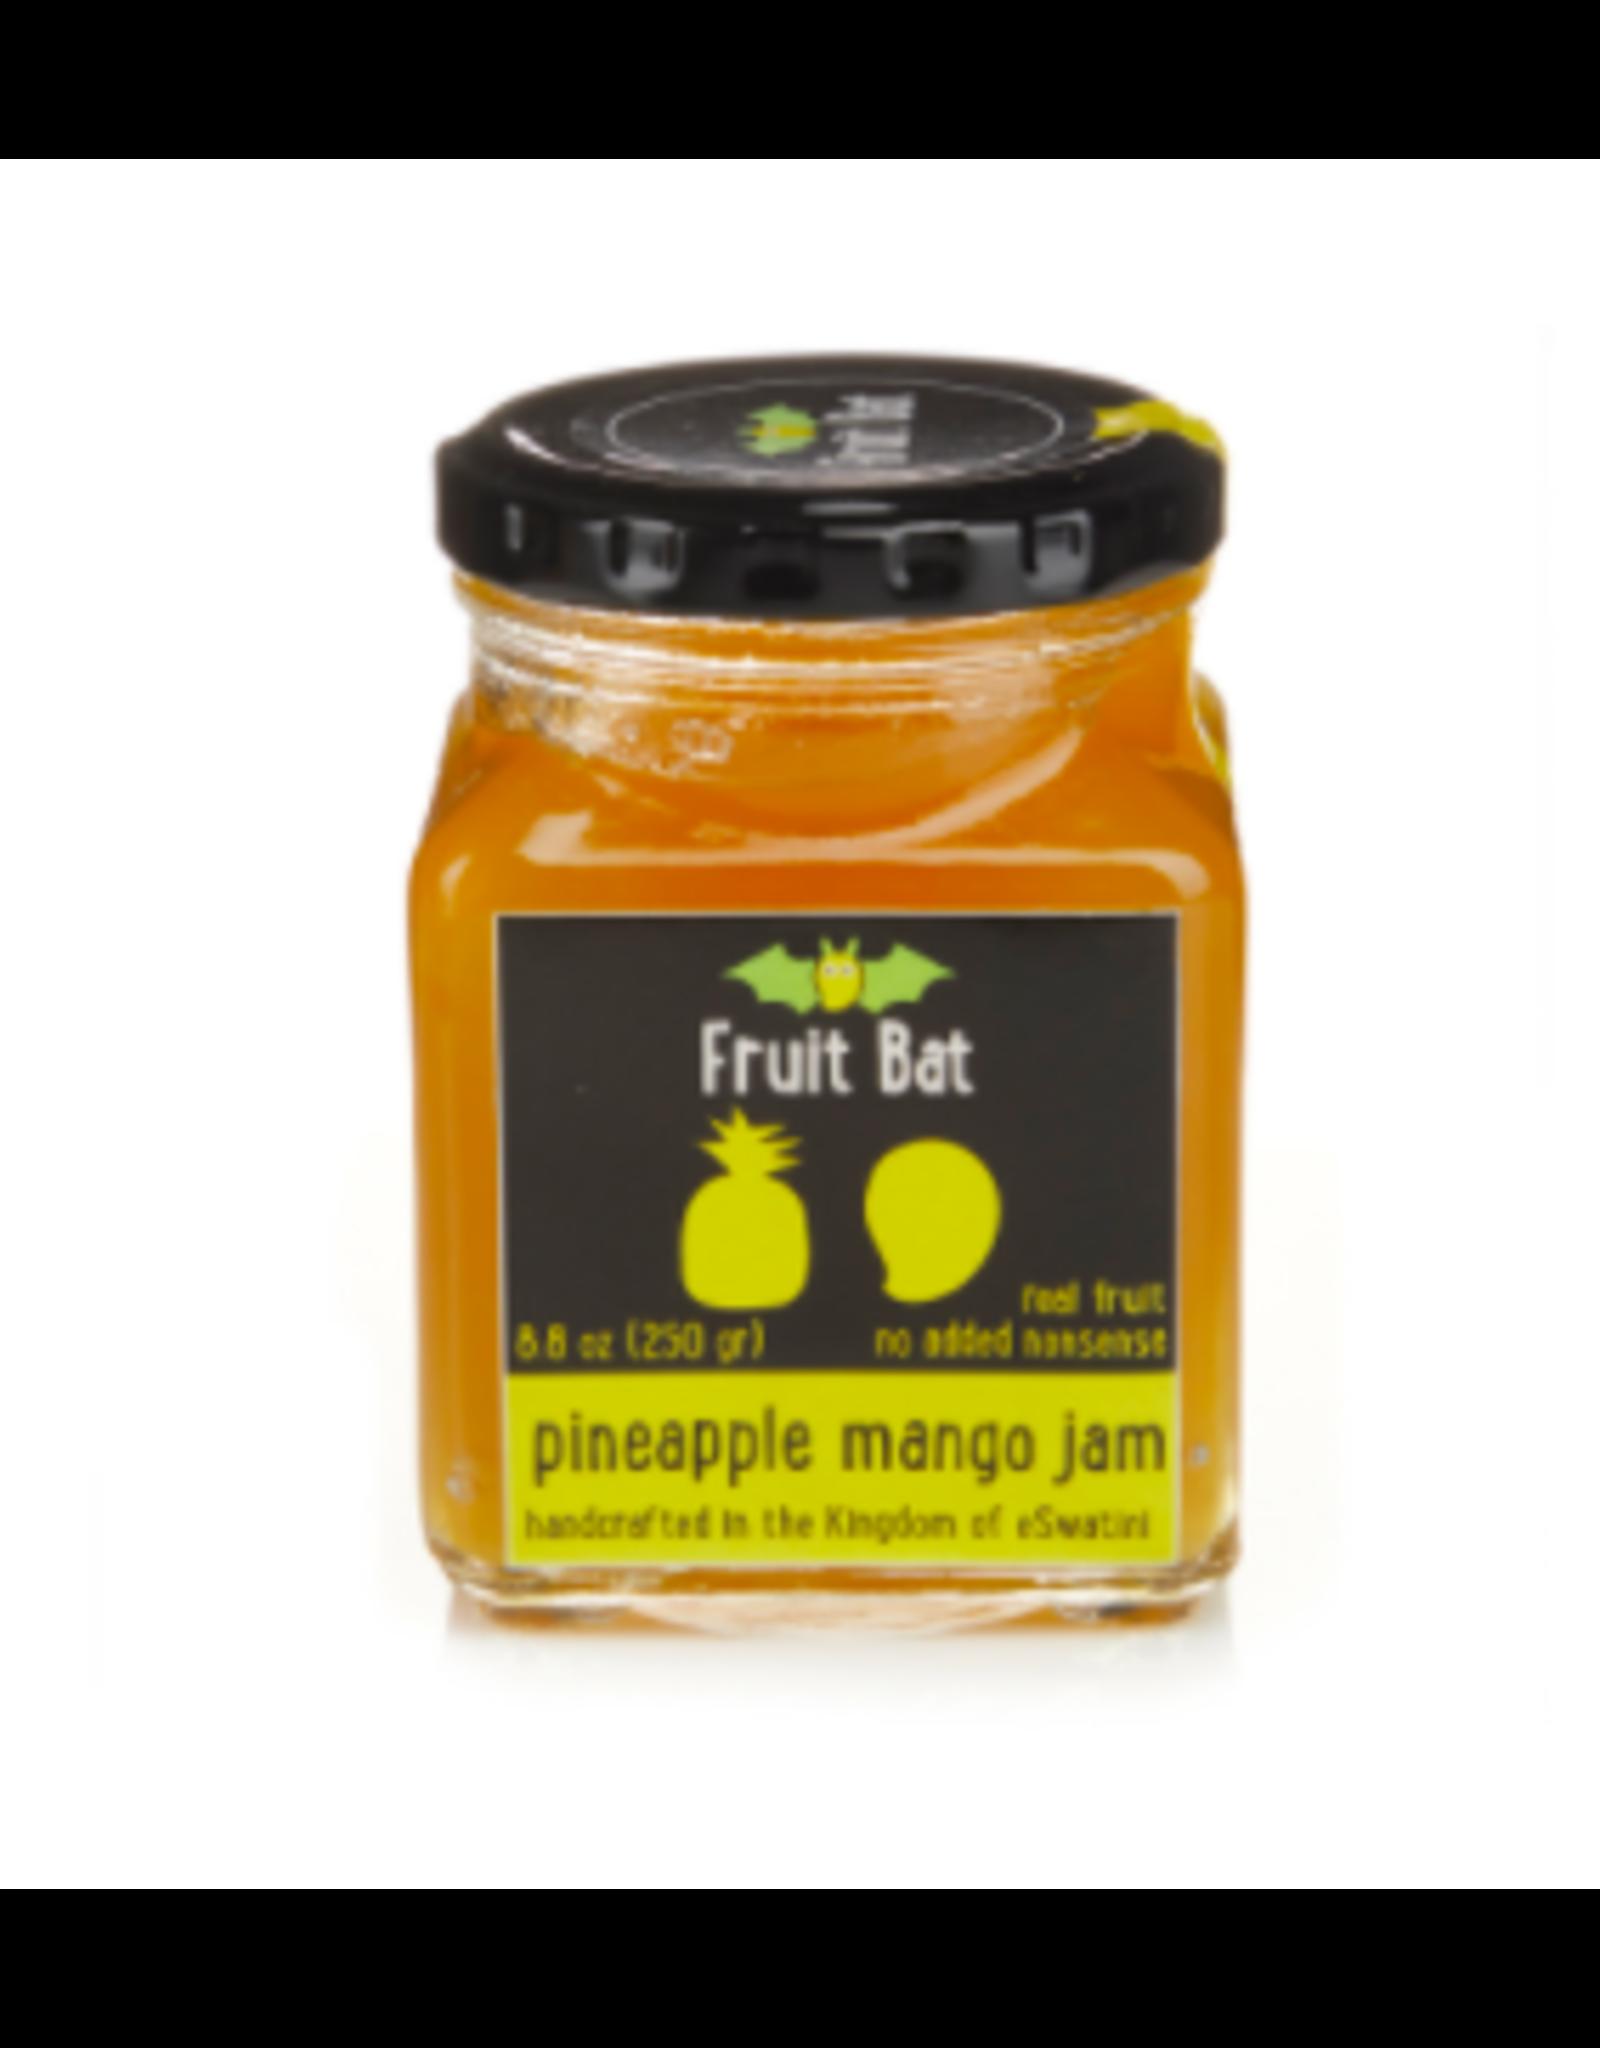 Mango and Pineapple Jam